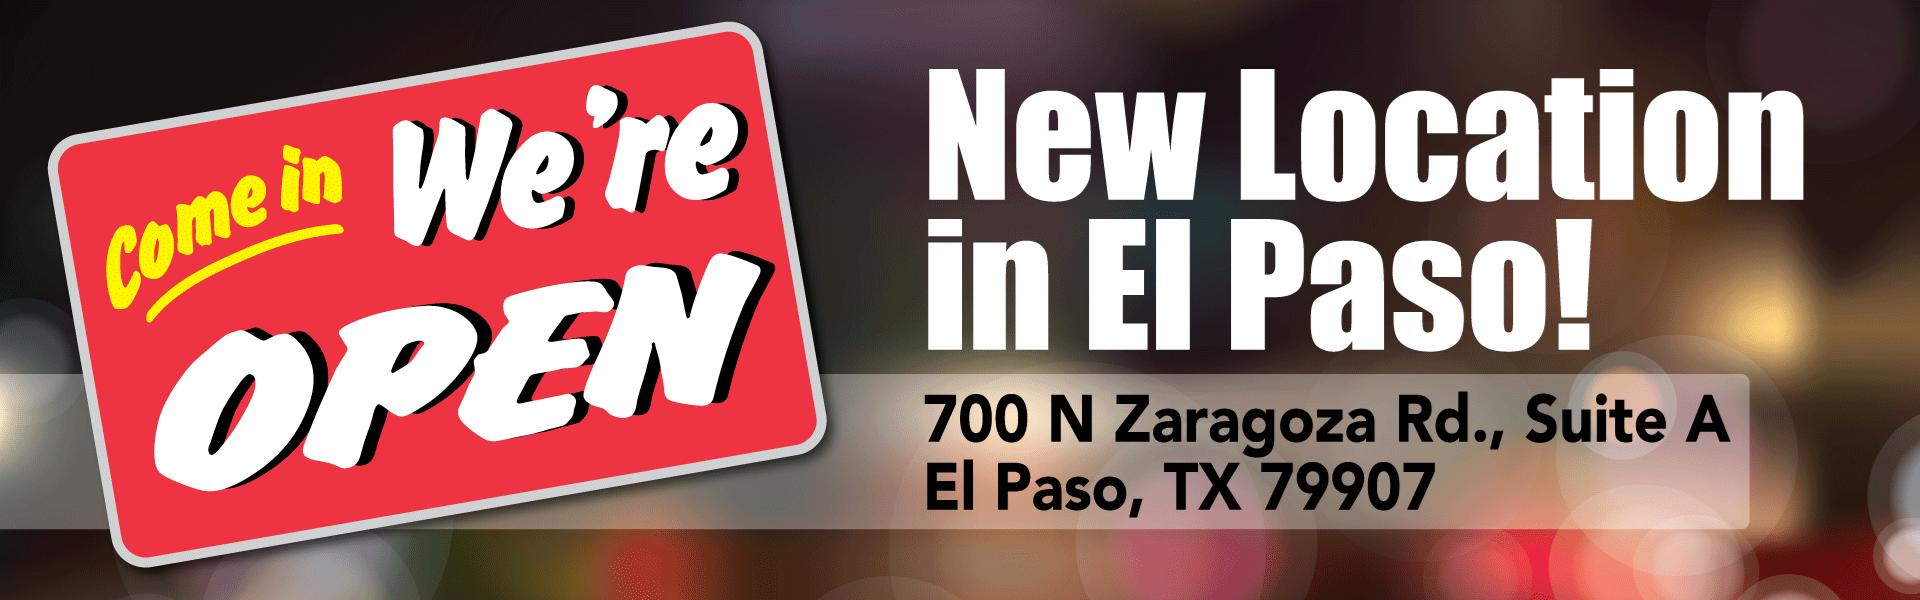 New Location Zaragoza